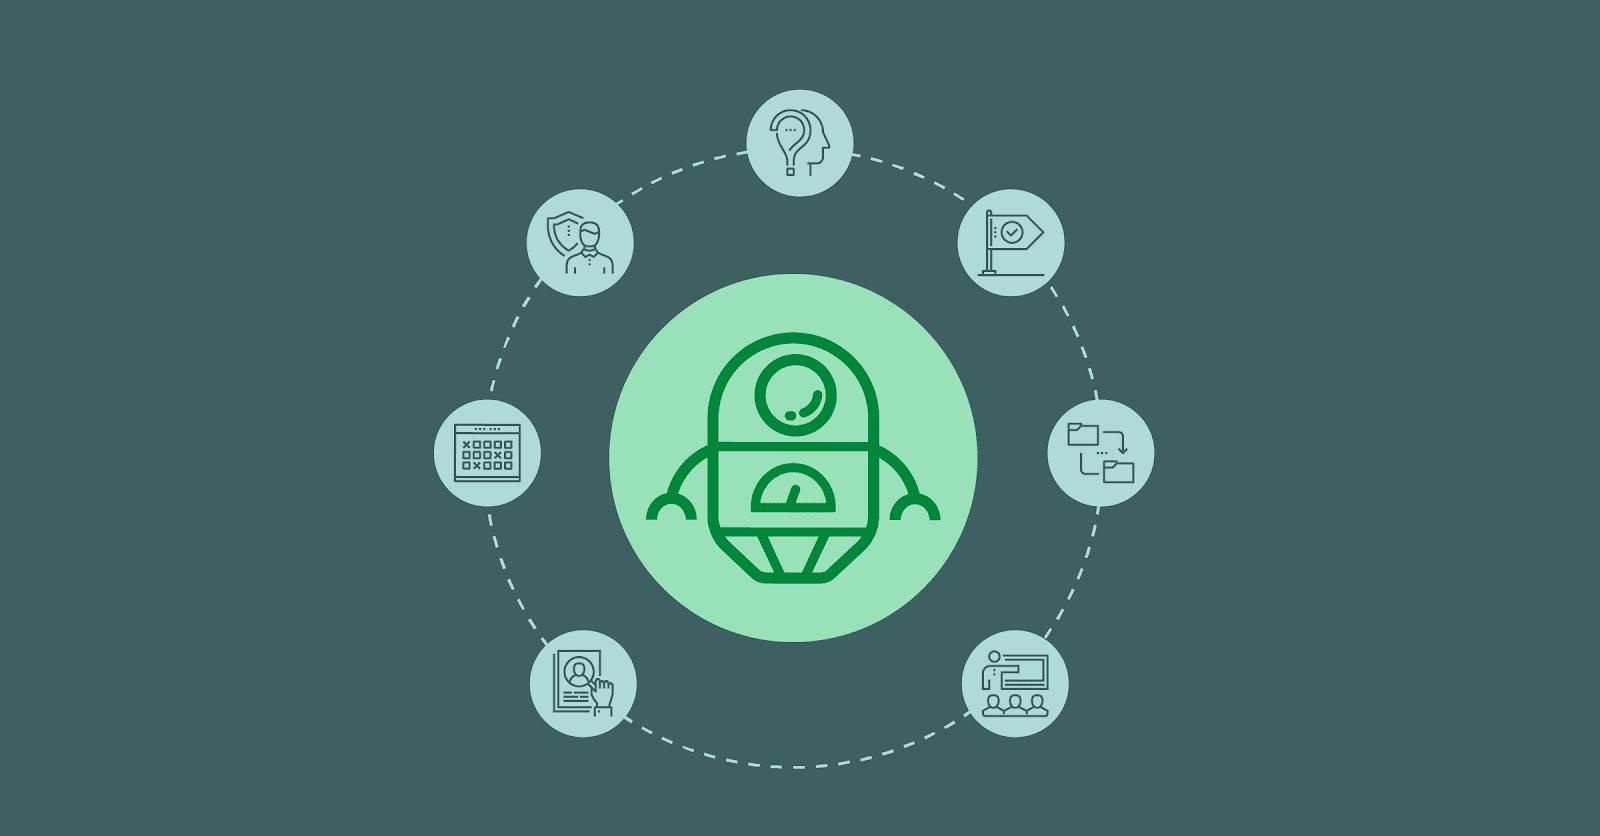 Chatbots for HR and internal enterprise